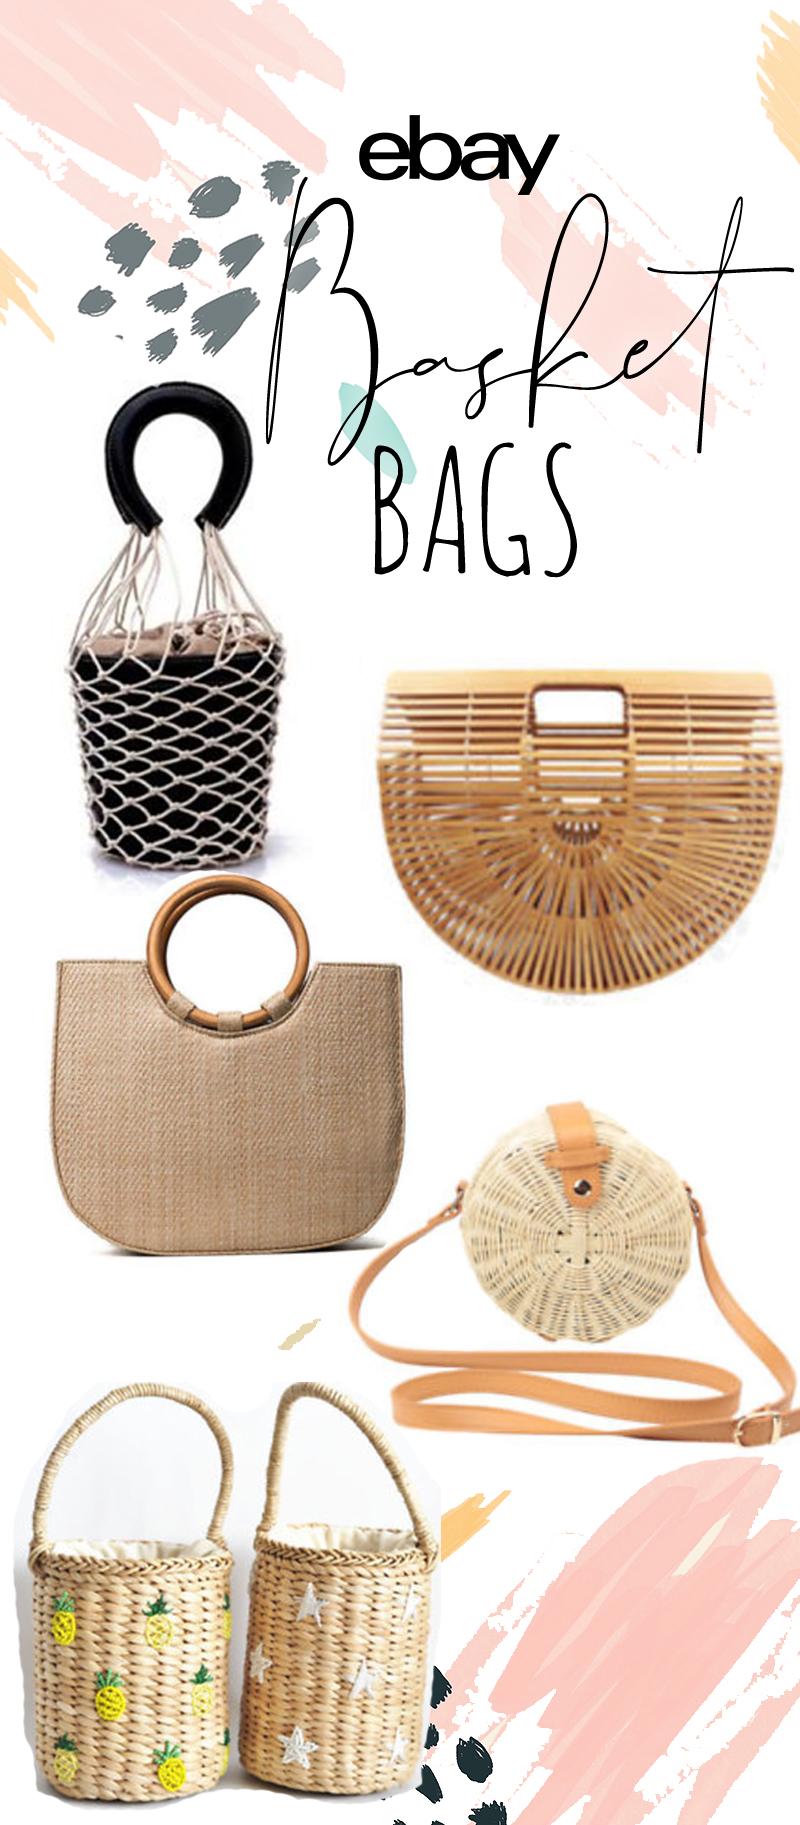 best eBay basket bag bargain. life of ellie grace. manchester, uk beauty and style blog. manchester blog. uk beauty blog. uk lifestyle blog. manchester lifestyle blog.